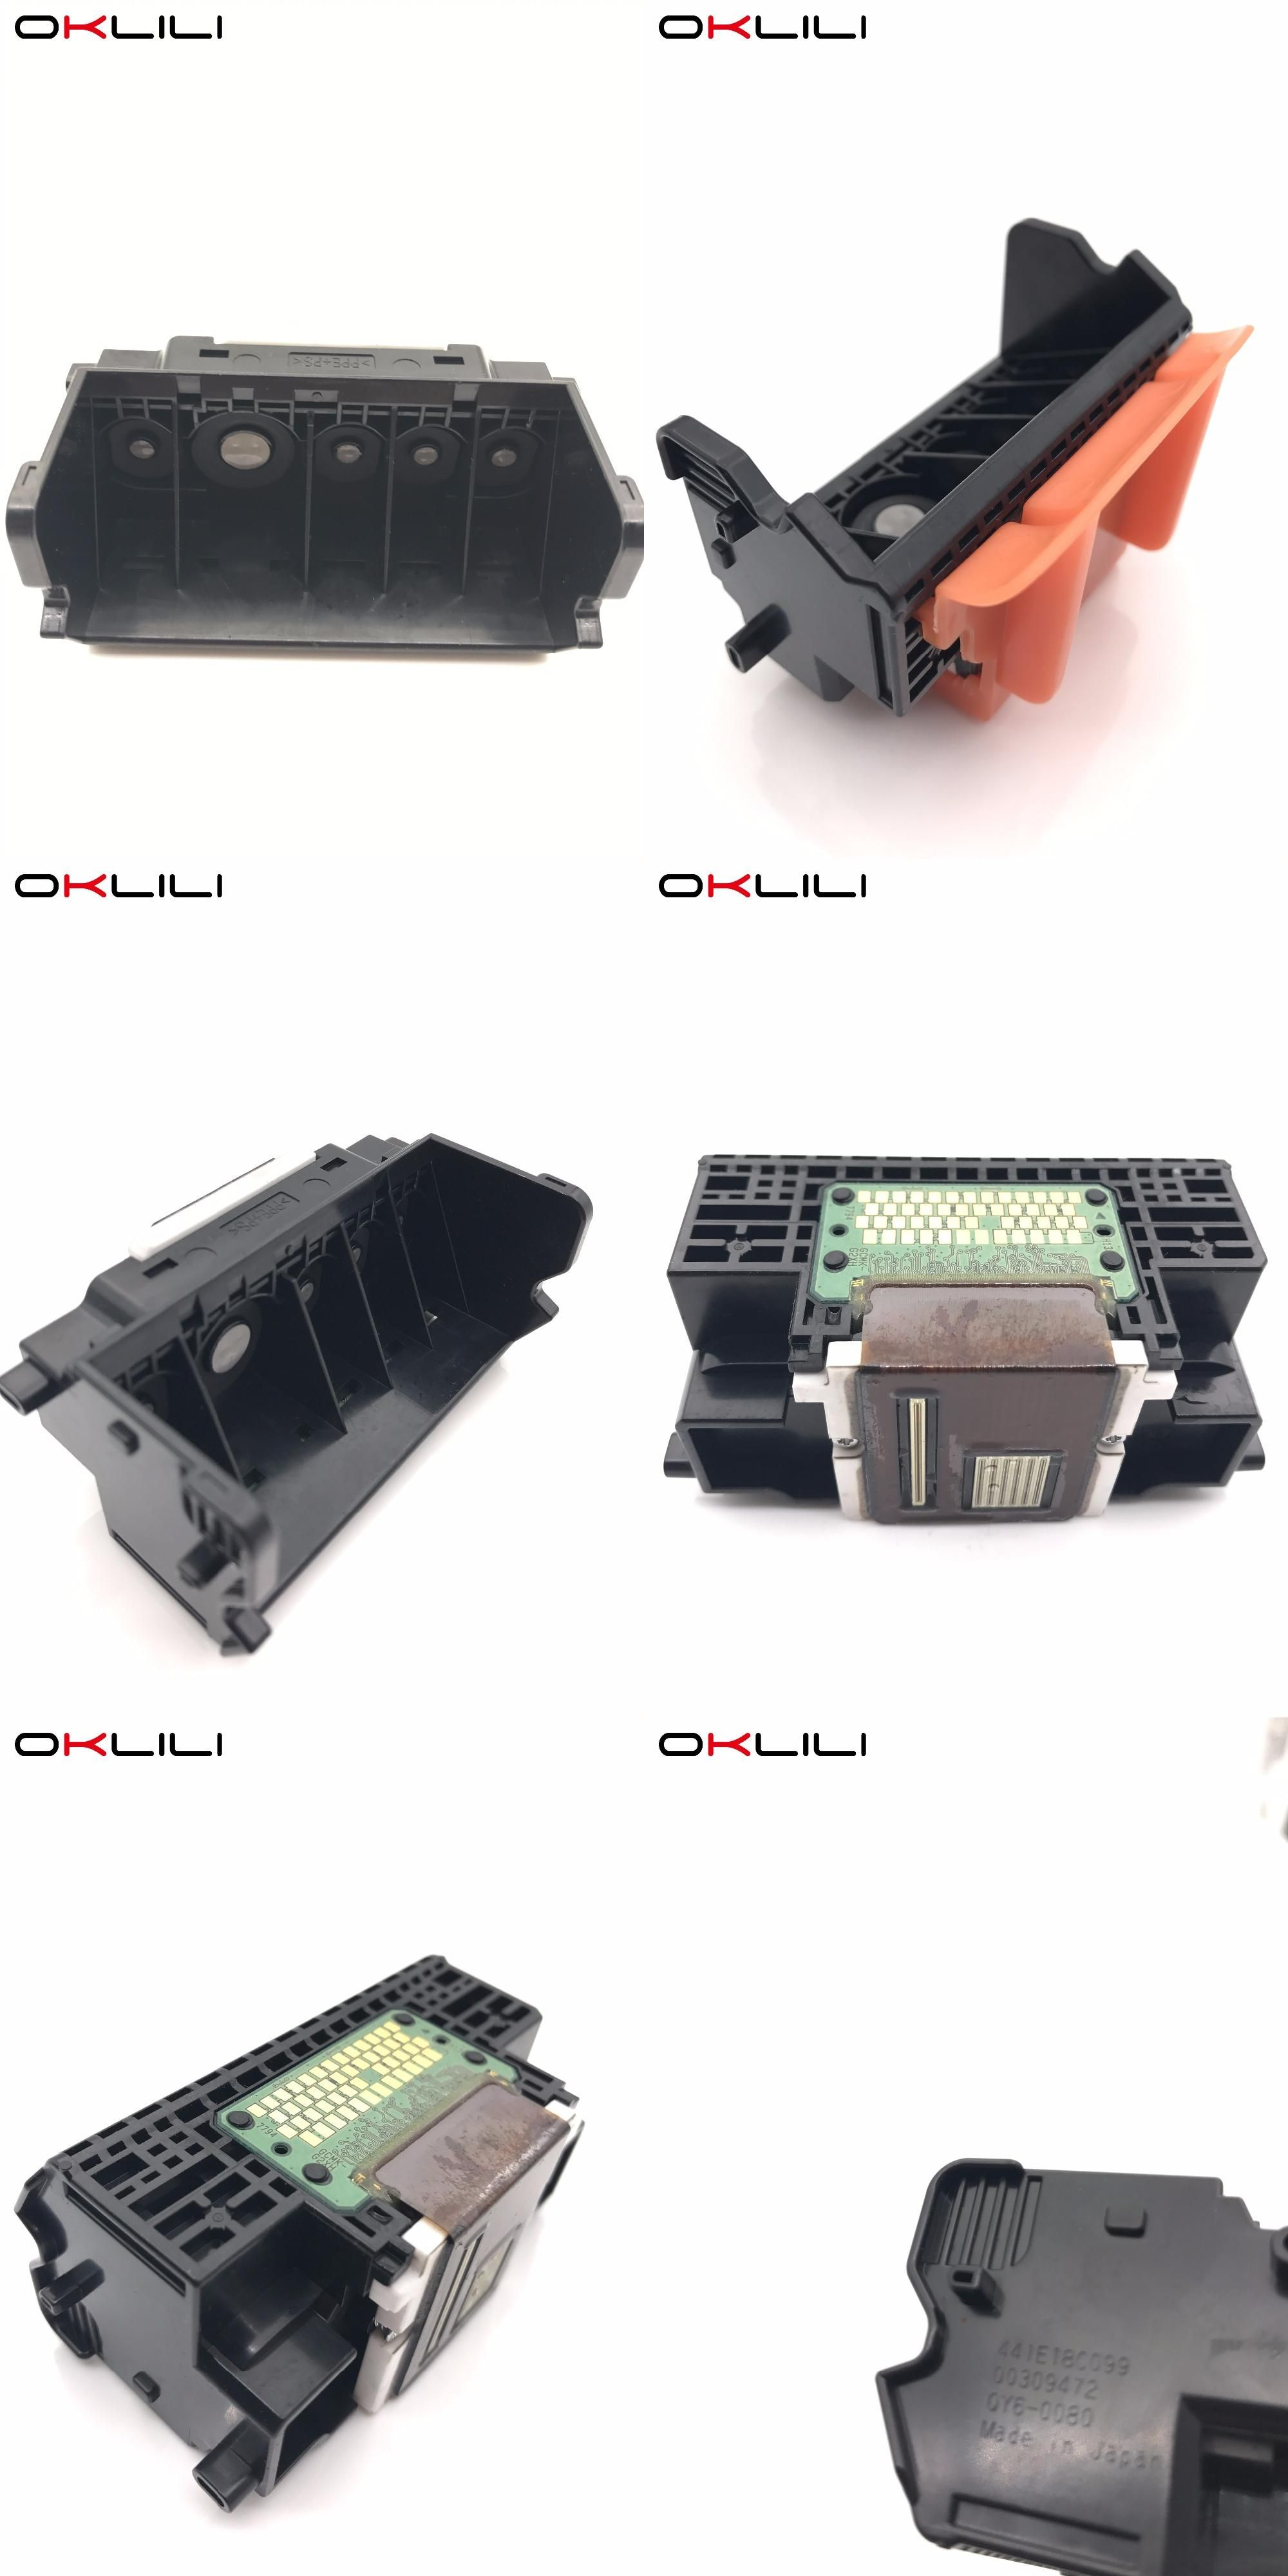 visit to buy oklili qy6 0080 printhead print head printer for canon ip4820 ip4850 ix6520 ix6550 mx715 mx885 mg5220 mg5250 mg5320 mg5350 advertisement [ 2000 x 3999 Pixel ]